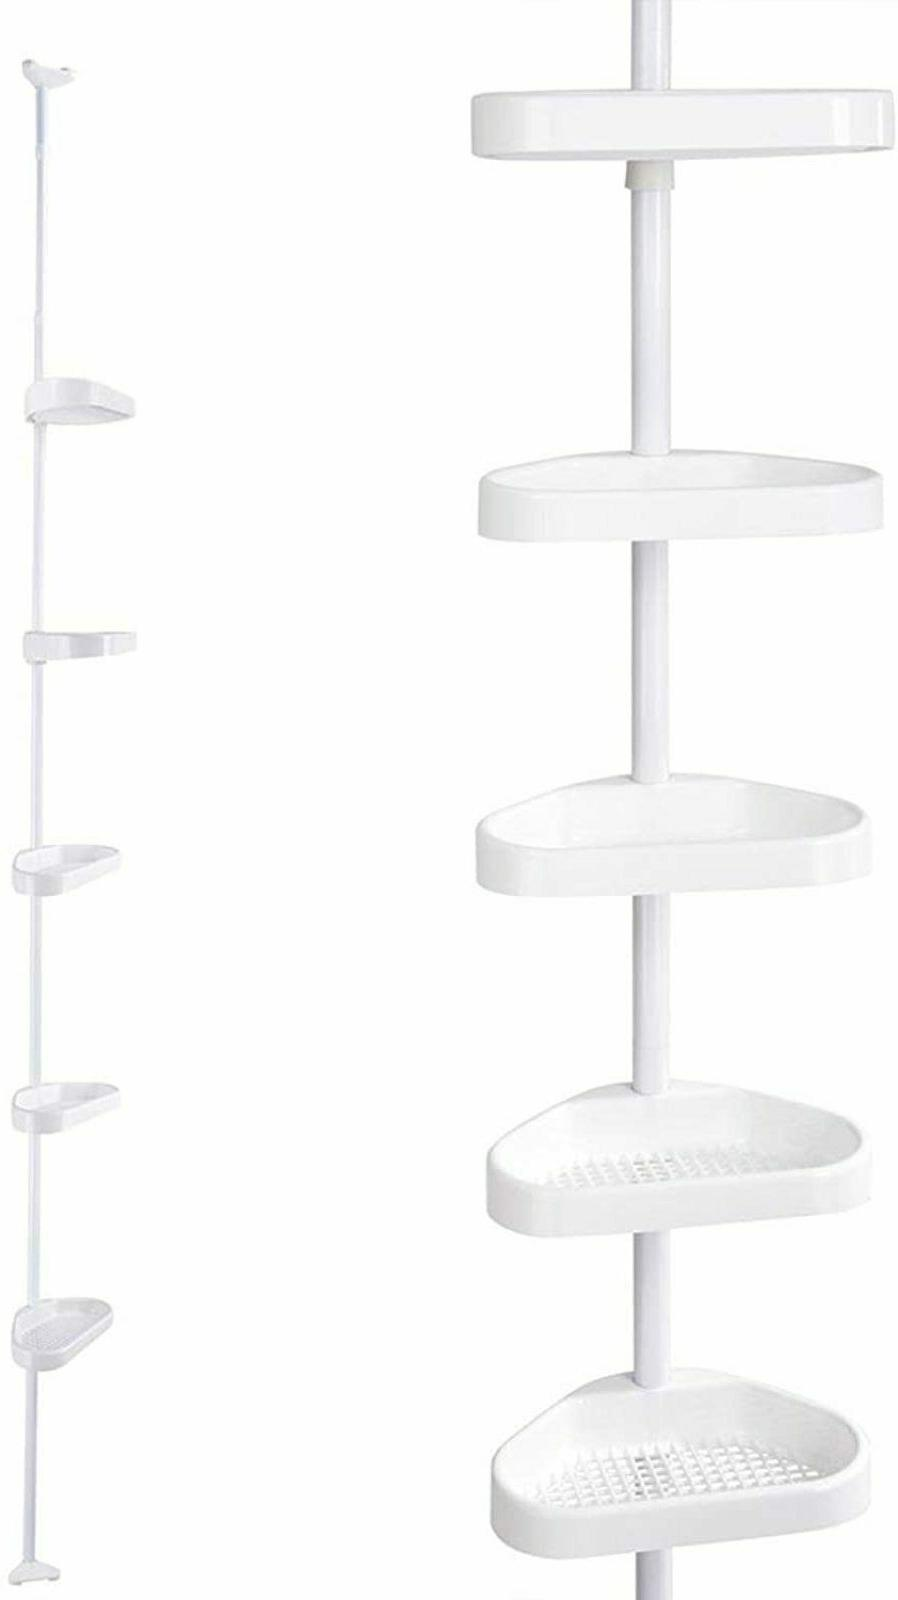 Bathroom Corner Shelf Bath Shower Caddy Pole Storage Rack To